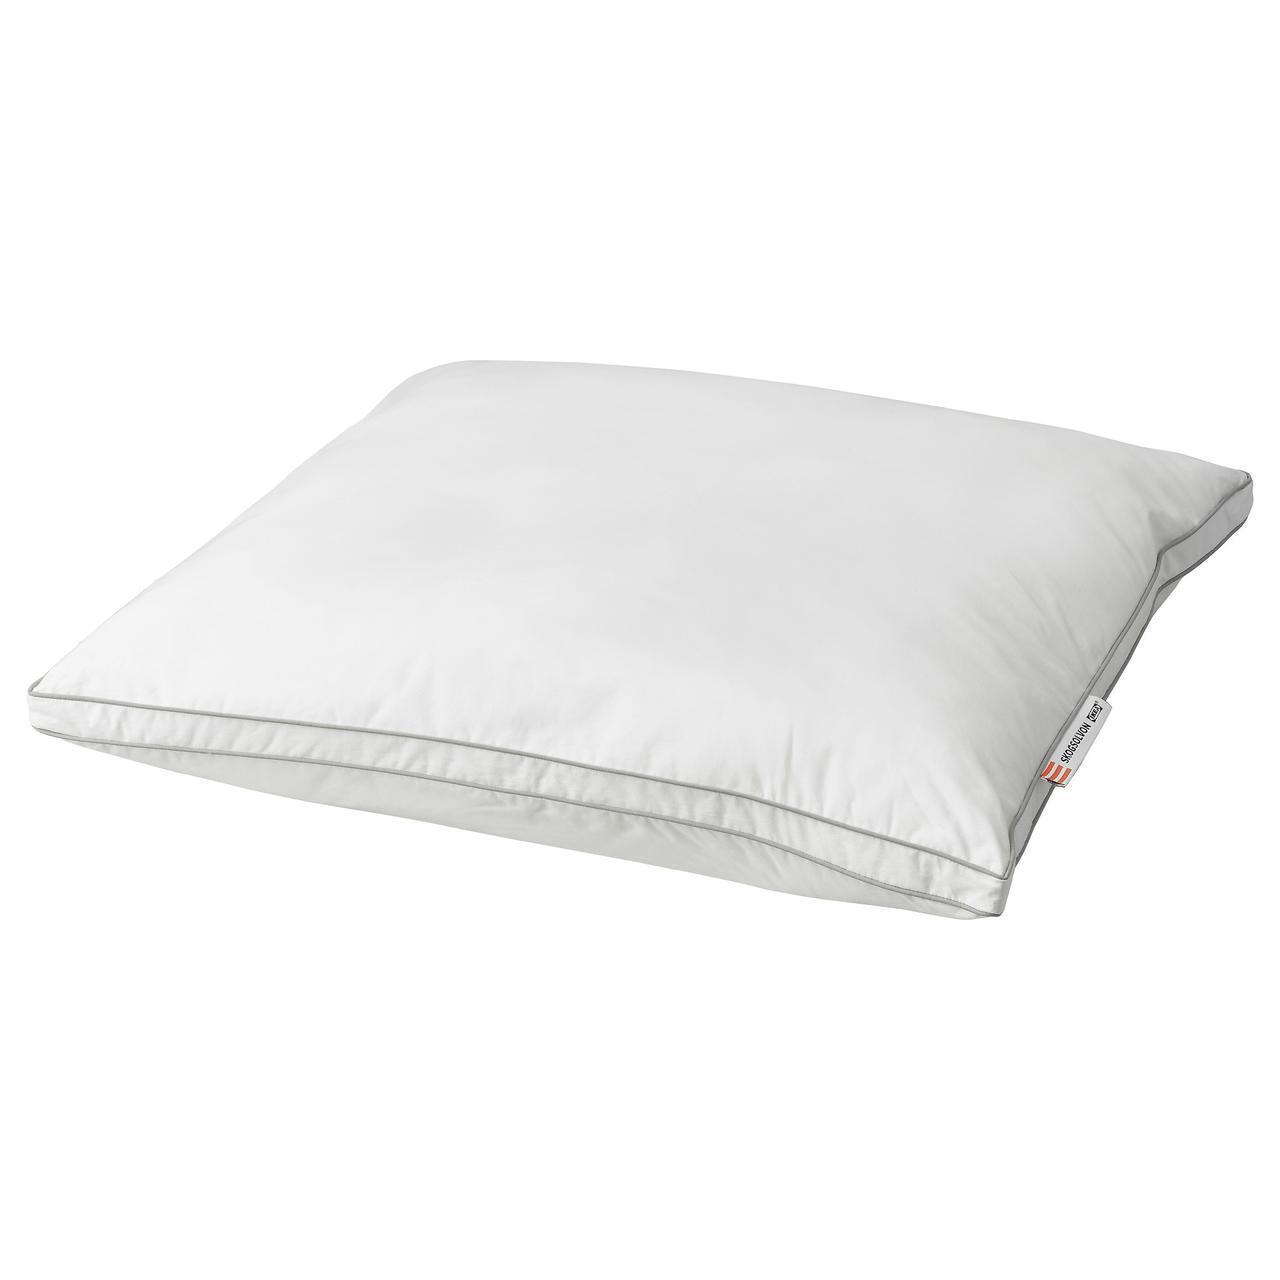 Подушка IKEA SKOGSOLVON 70x80 см низкая 404.343.03